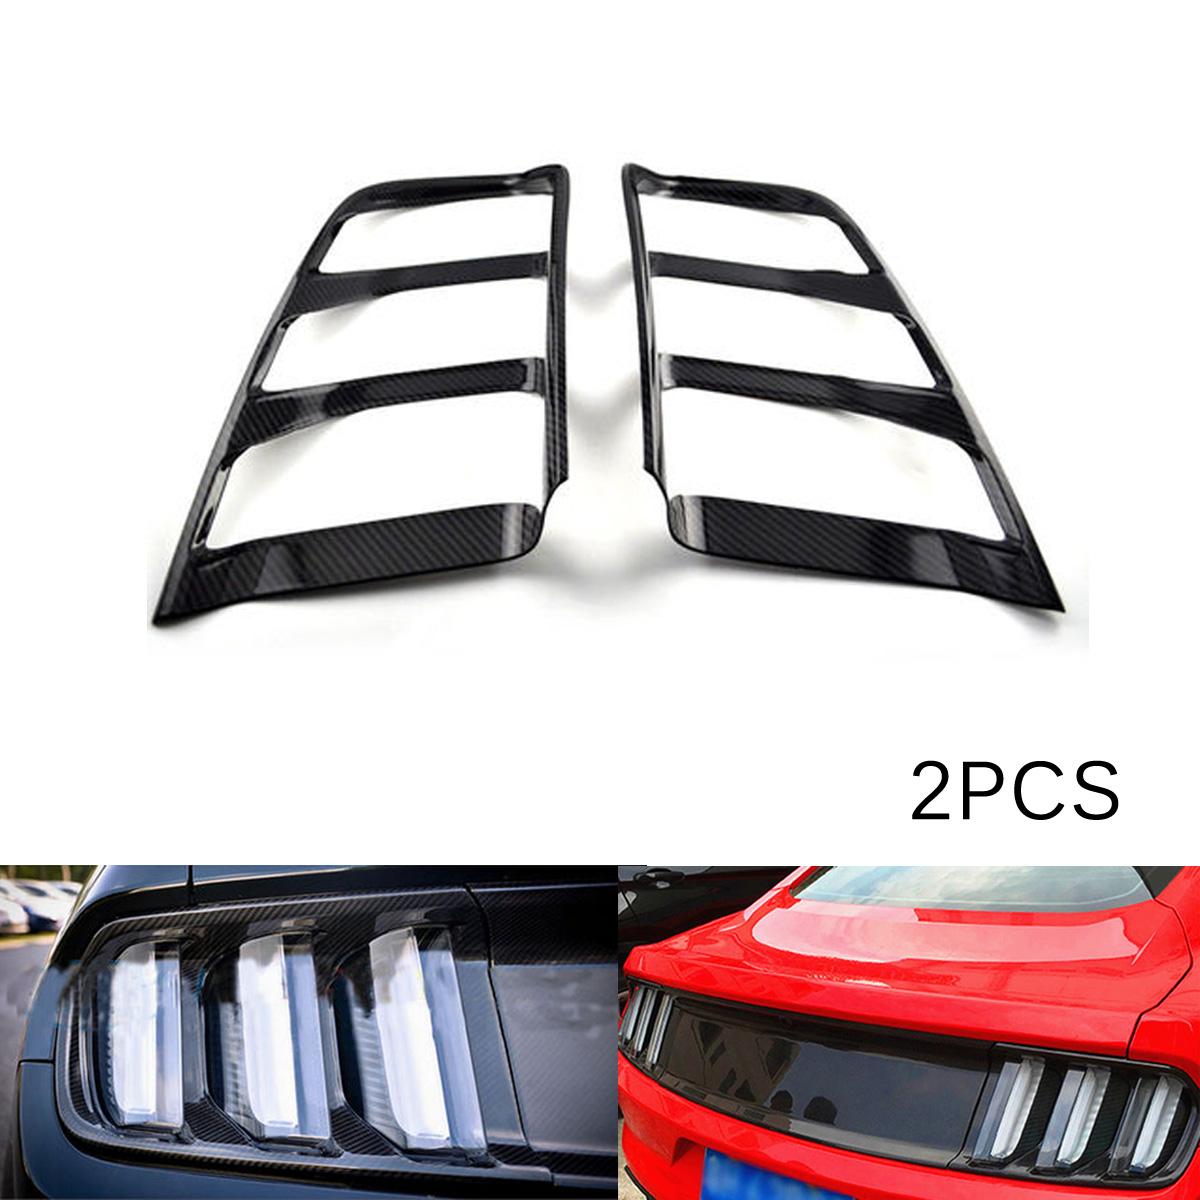 Chrome Rear Side Bumper Warning Light Cover Trim 2pcs For Ford Mustang 2015-2017